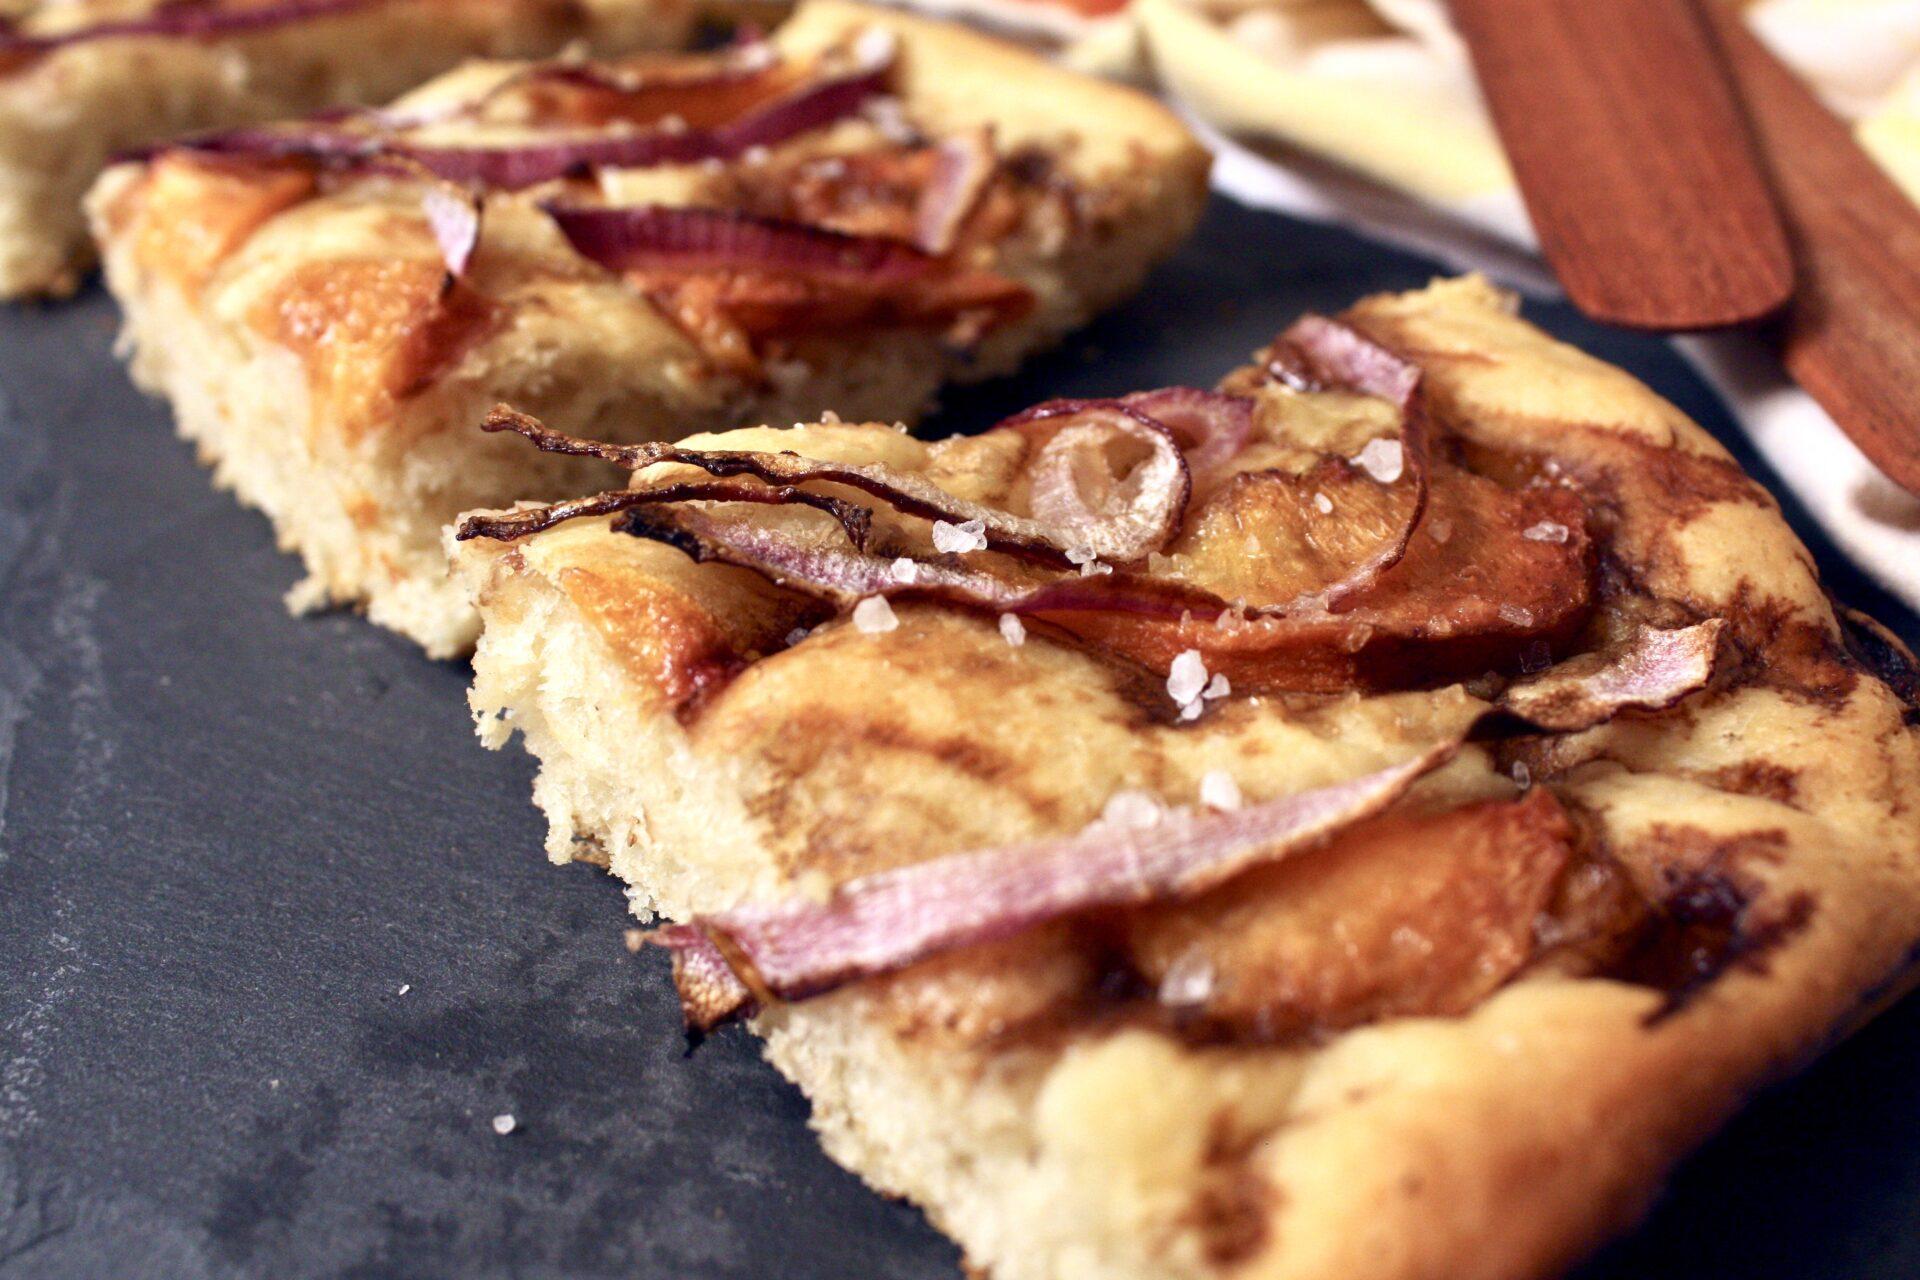 Piece of Balsamic Peach & Red Onion Focaccia Bread